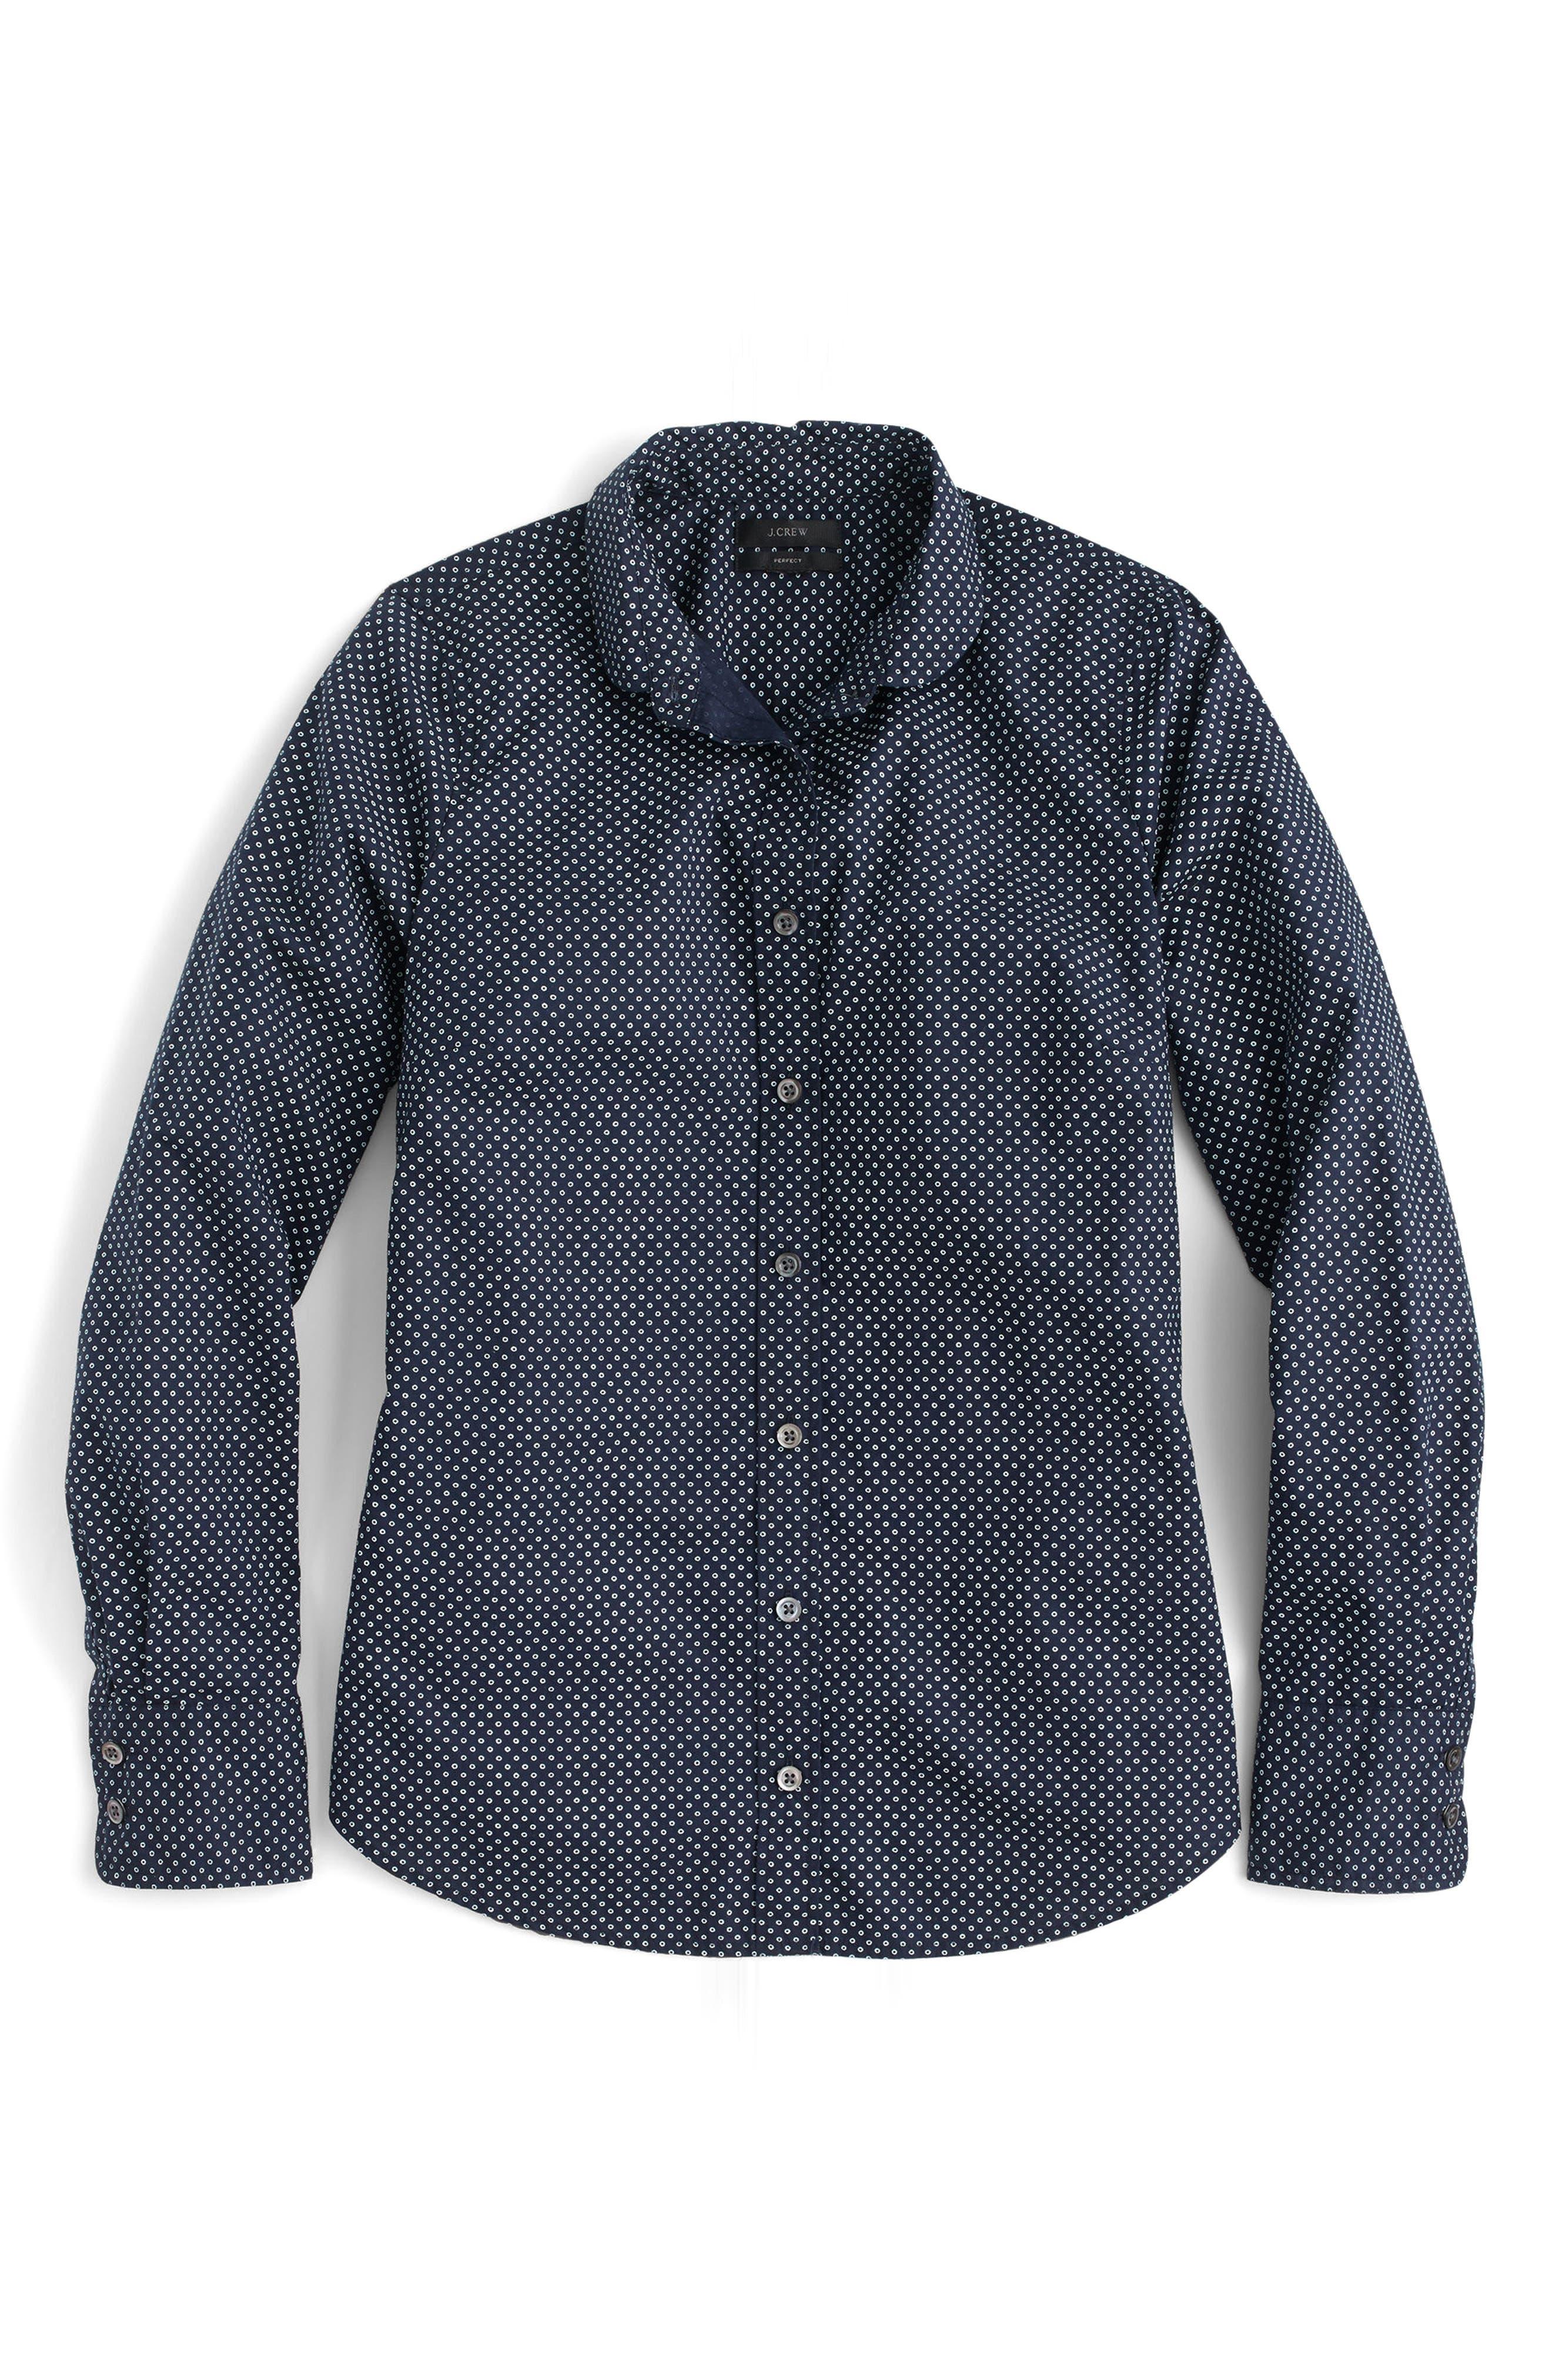 Alternate Image 4  - J.Crew Polka Dot Button-Up Shirt (Regular & Petite)